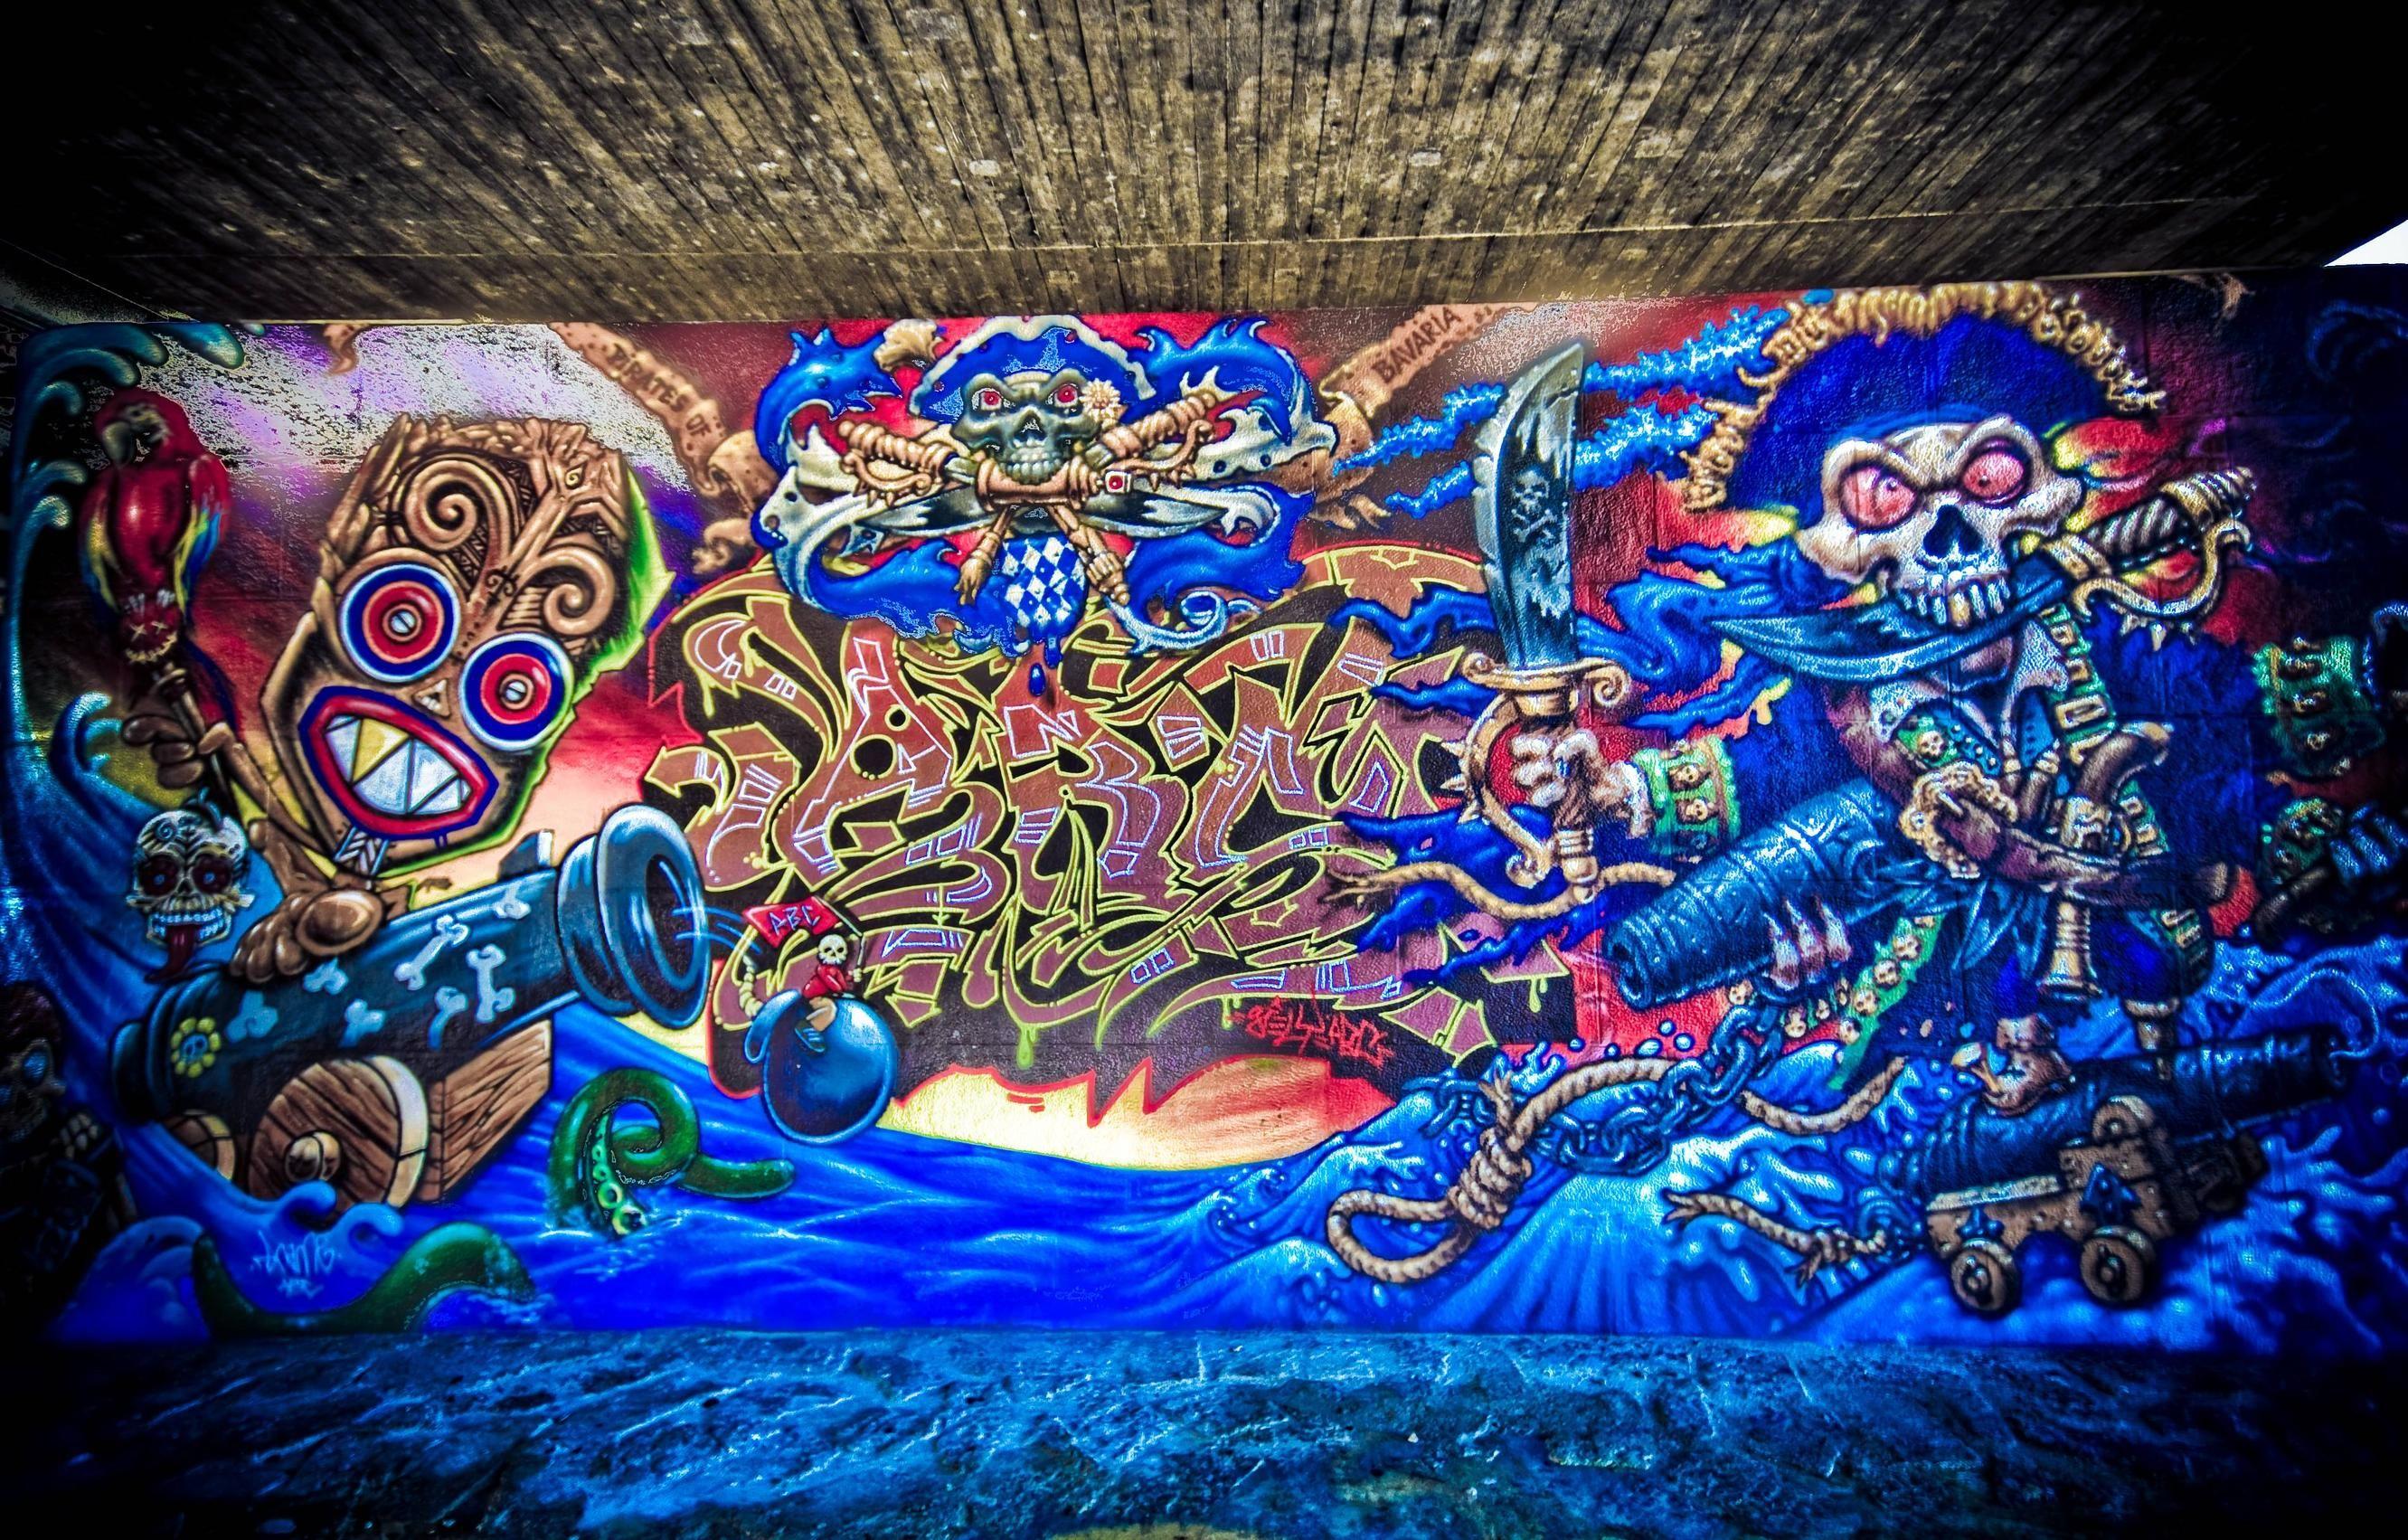 Hd graffiti wallpapers wallpaper wallpapers pinterest hd graffiti wallpapers wallpaper voltagebd Gallery